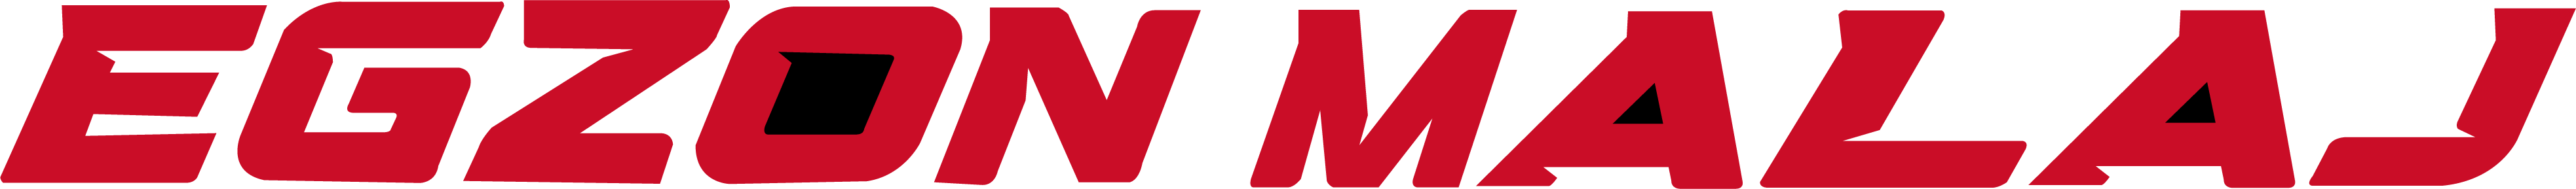 Egzon Malaj